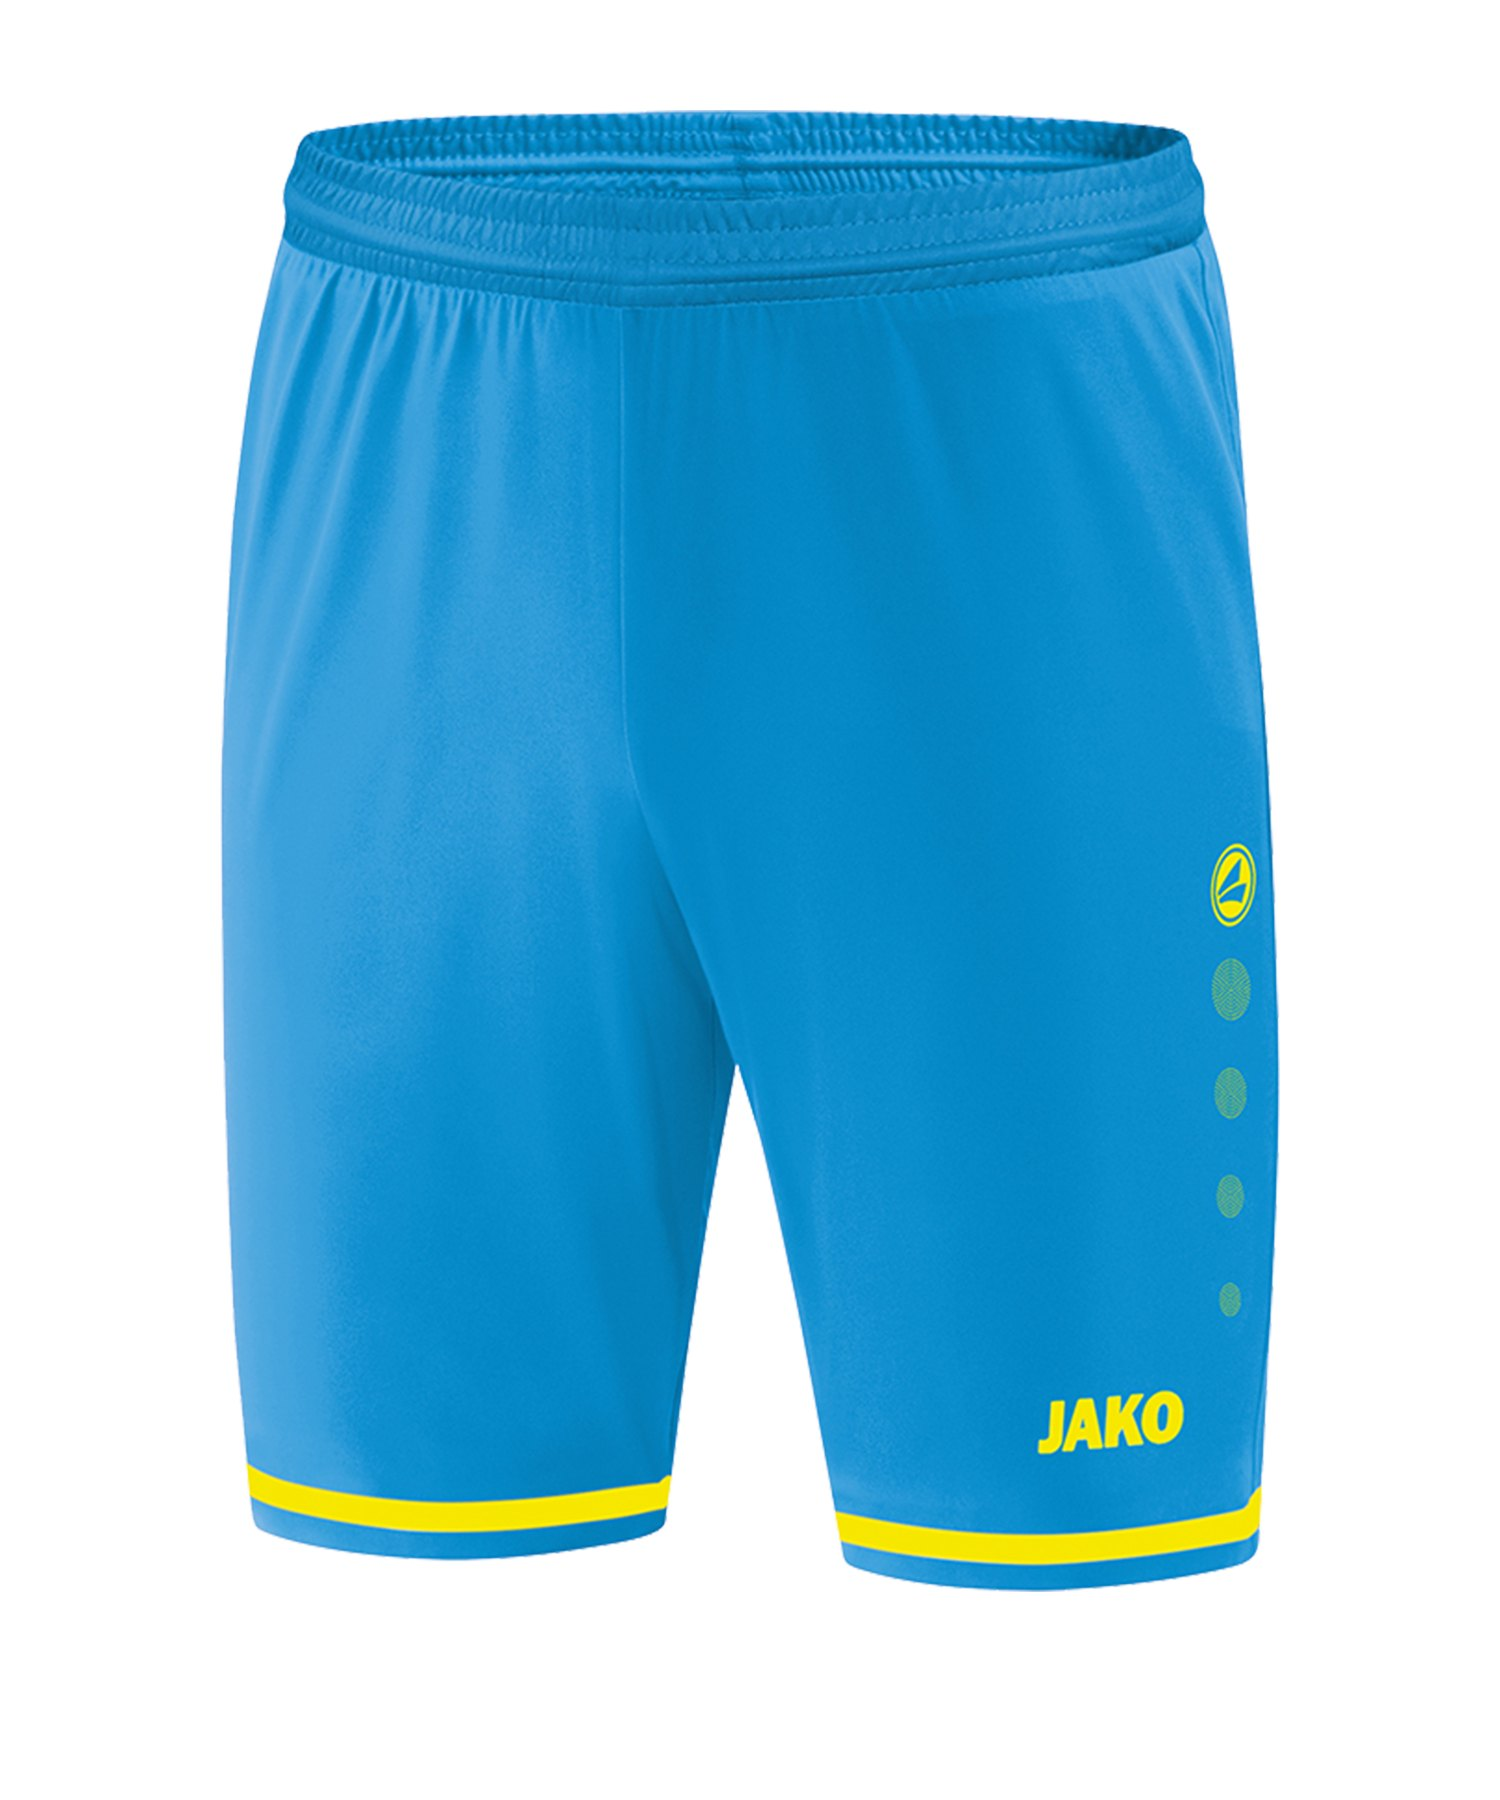 Jako Striker 2.0 Short Hose kurz Blau Gelb F89 - Blau